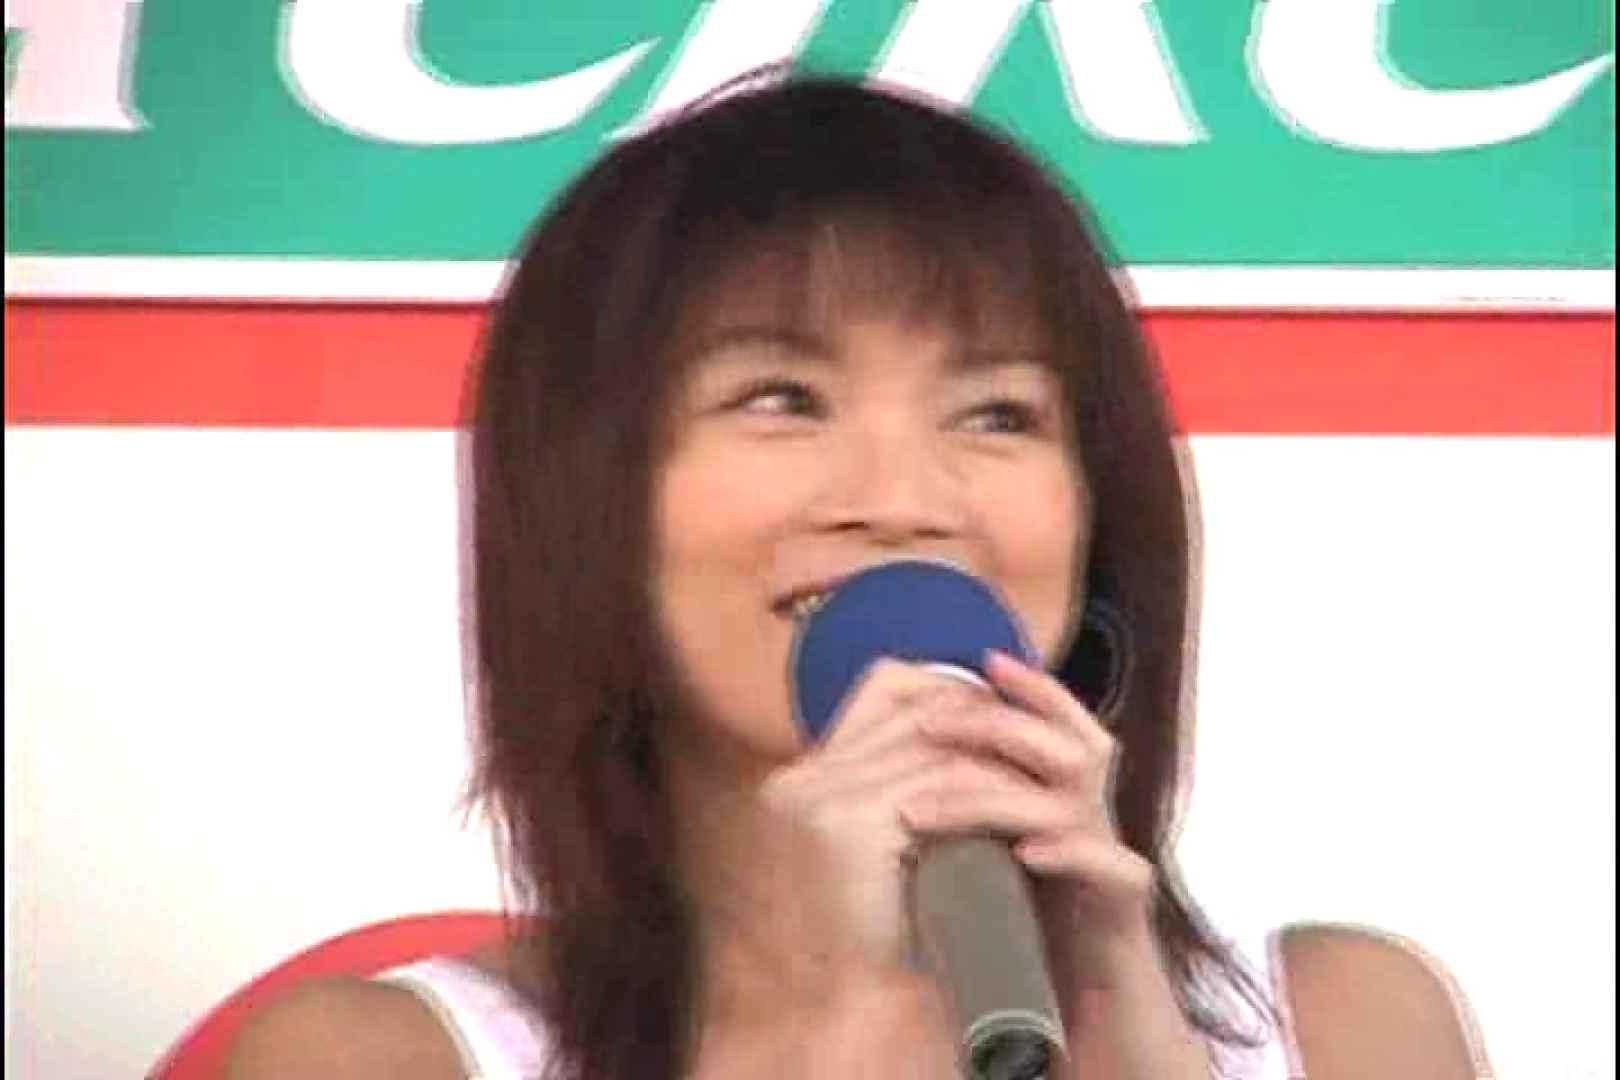 RQカメラ地獄Vol.10 乳首 オマンコ動画キャプチャ 31連発 27